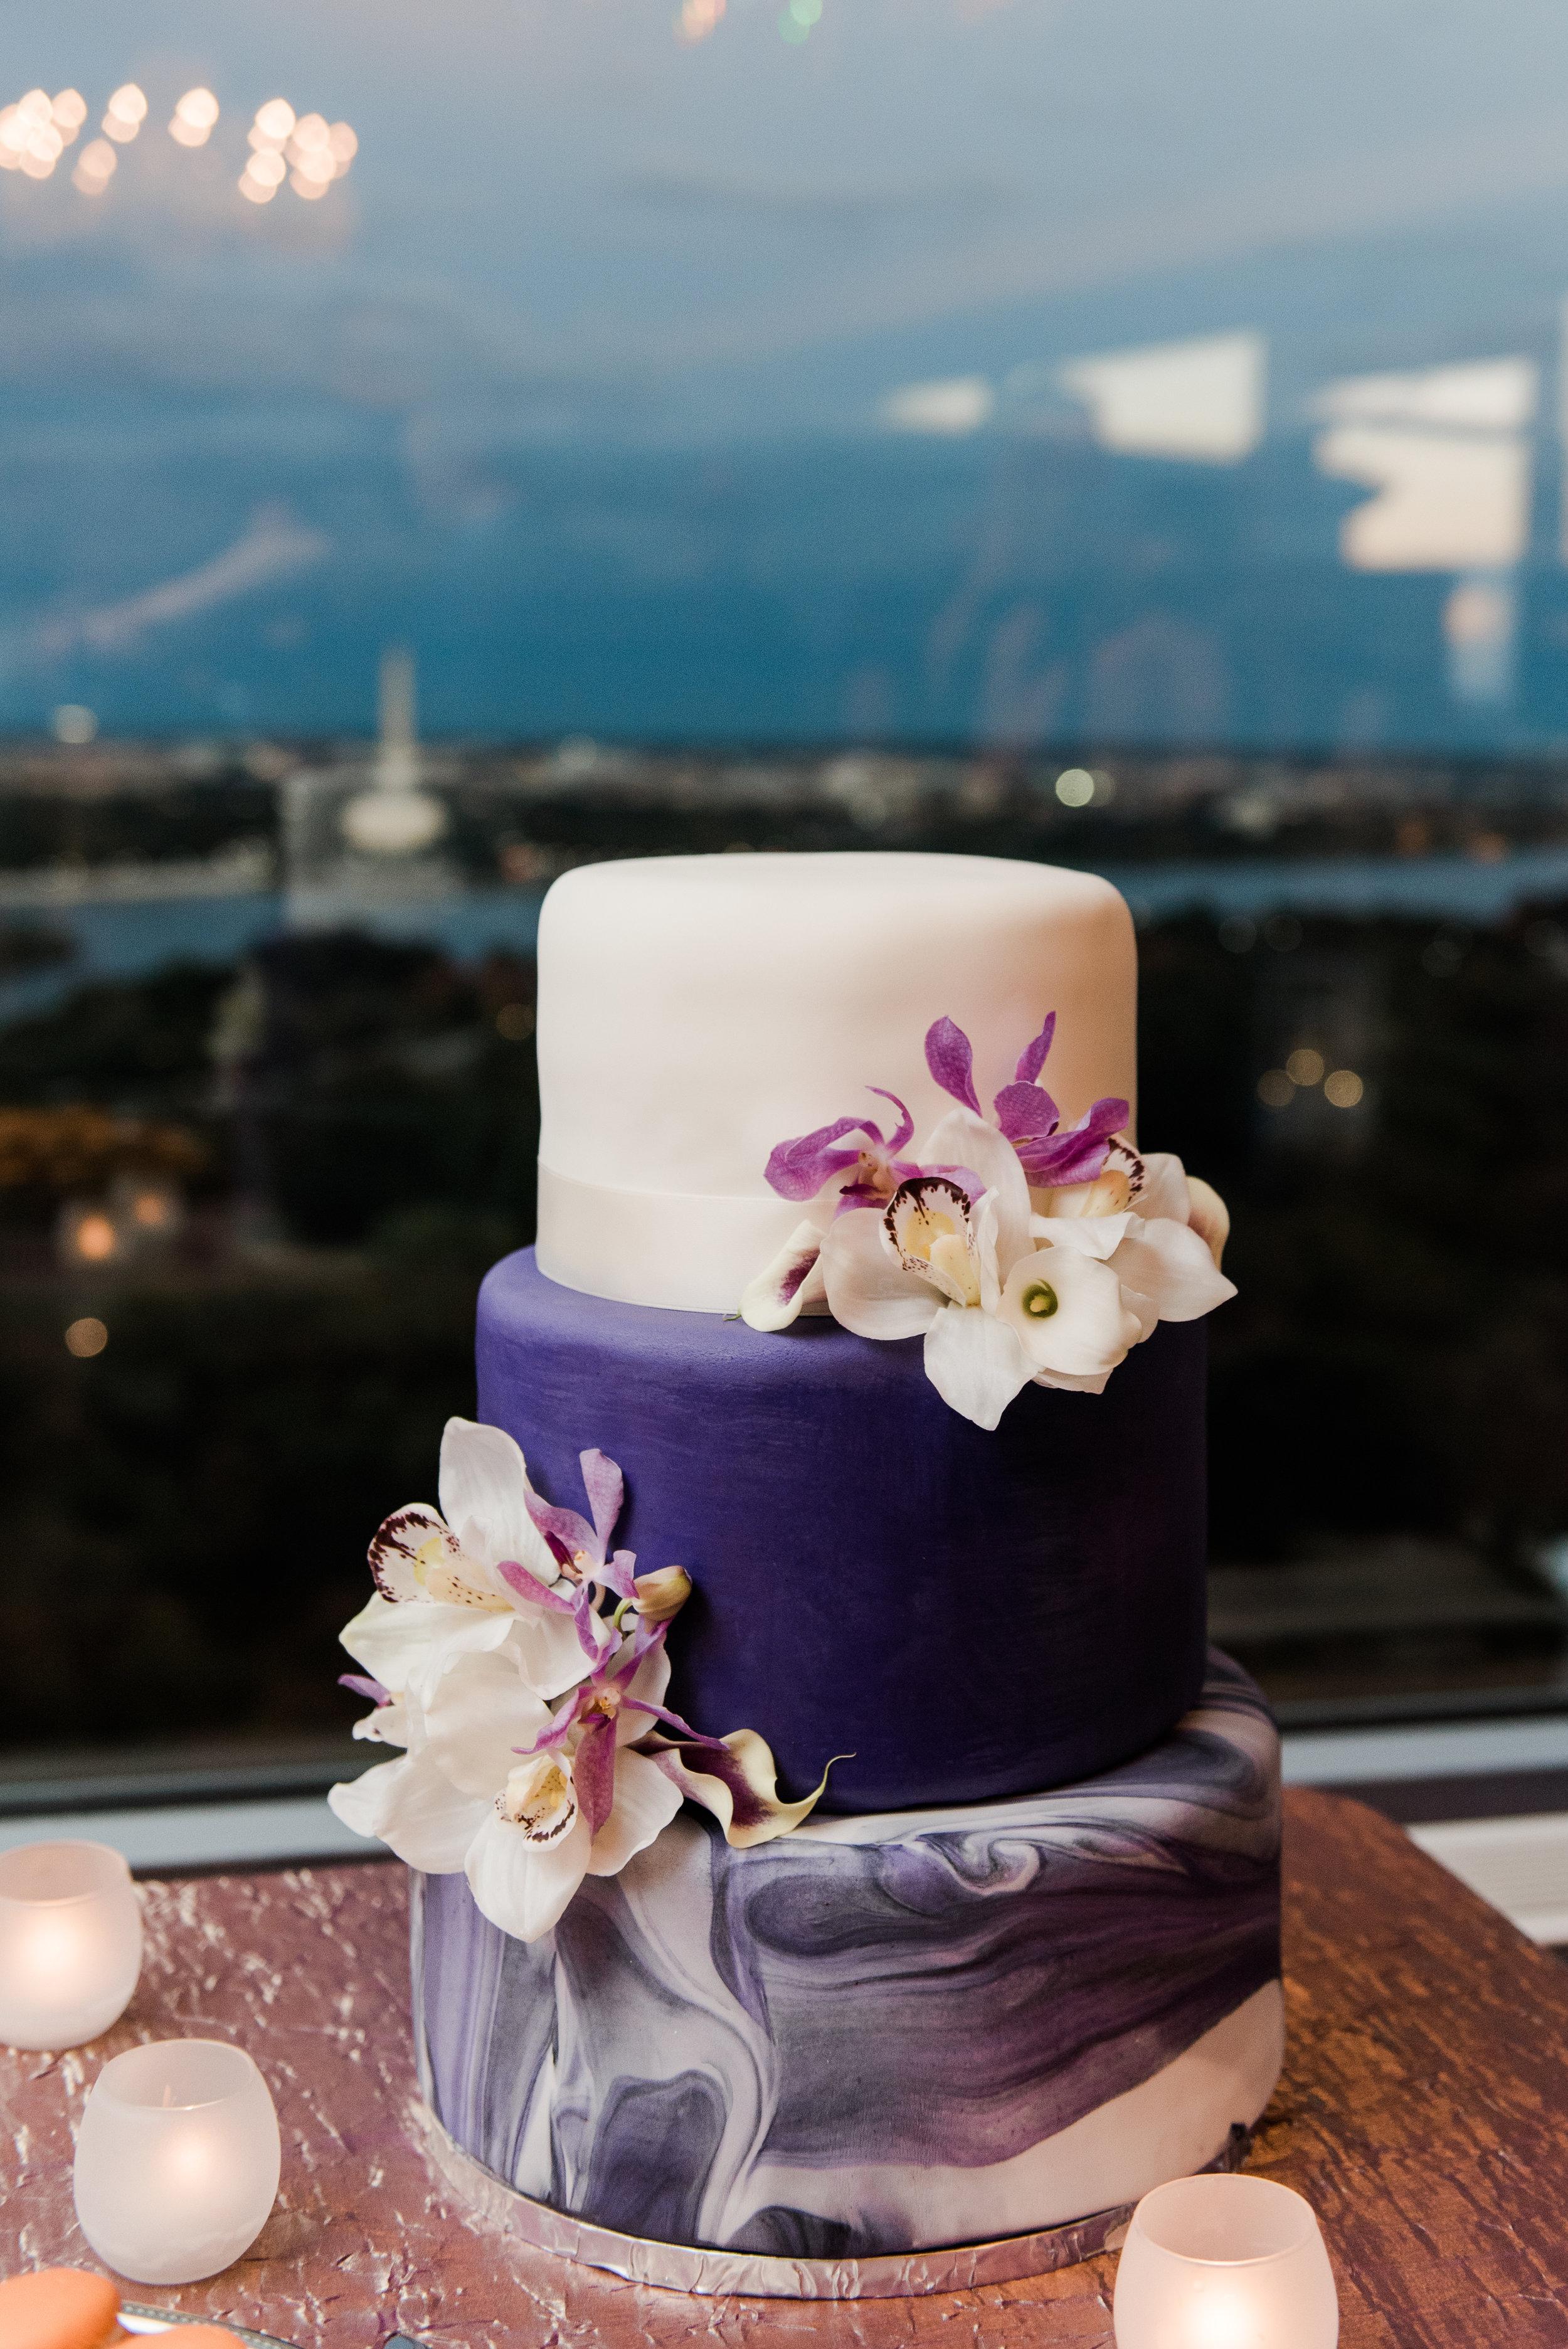 DavidAmandaMundy-Wedding-10282017-KathrynIvyPhotography-430.jpg